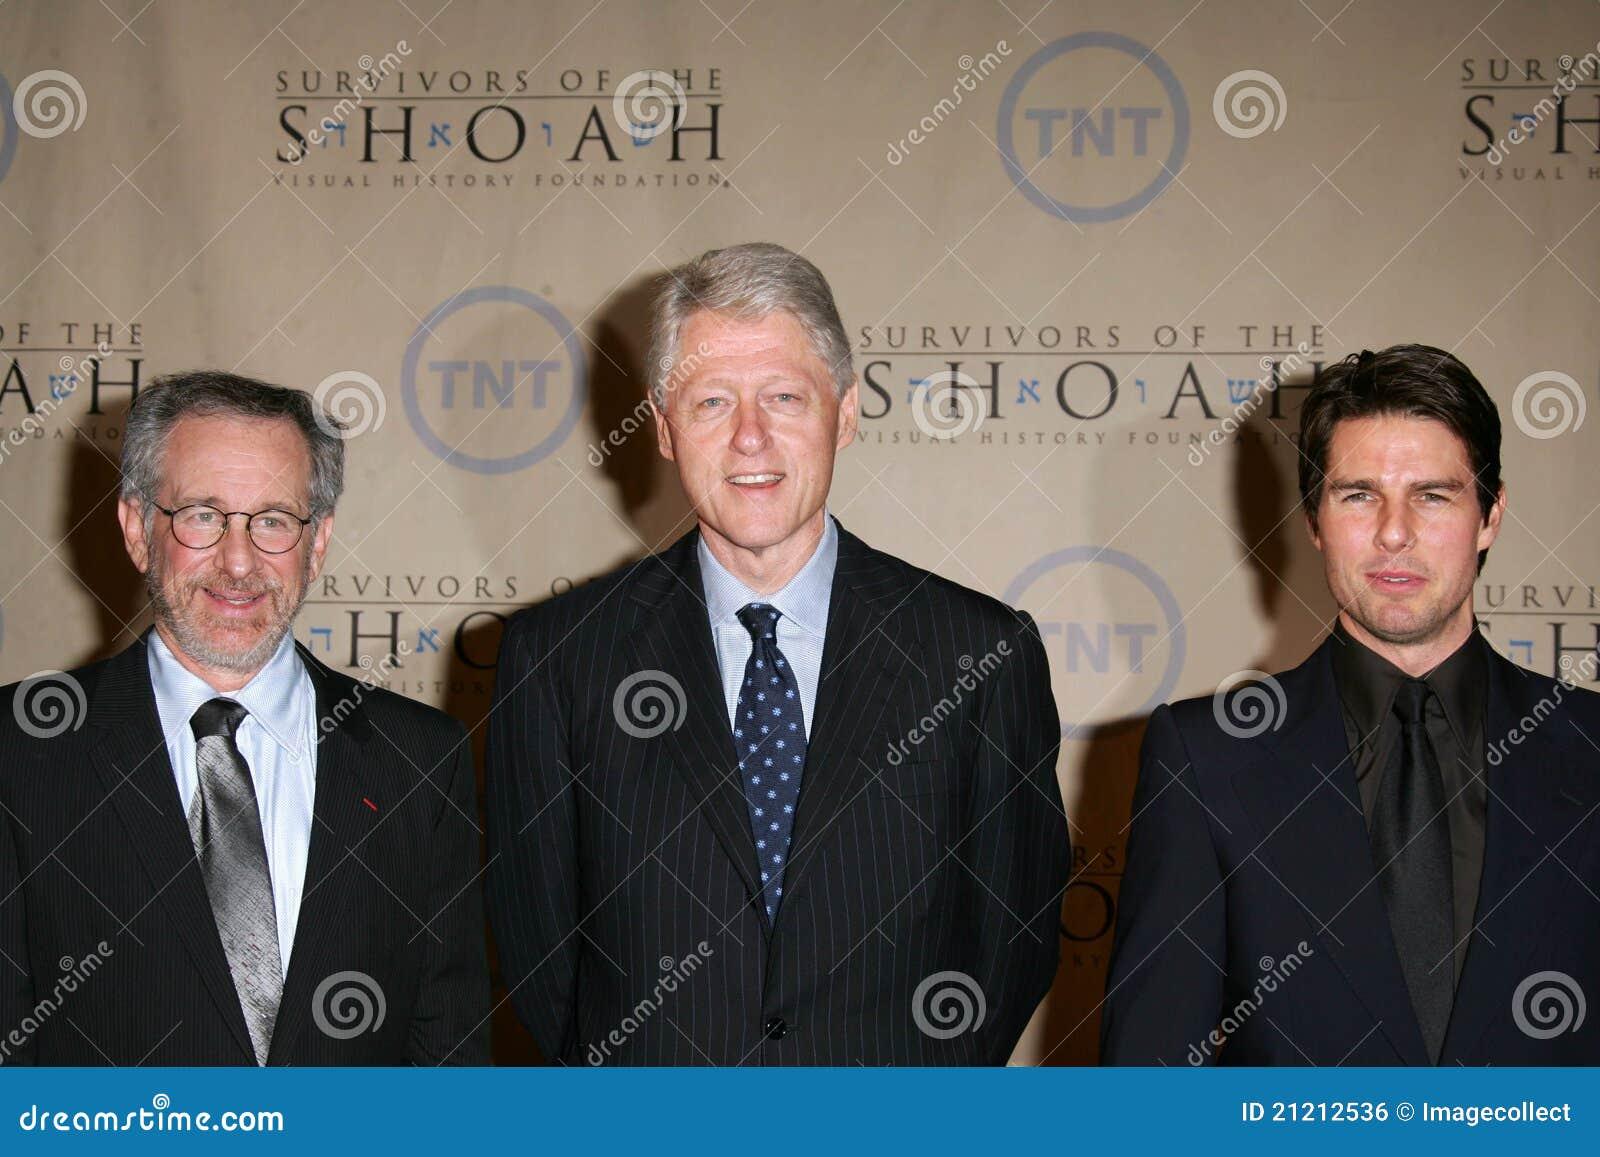 ¿Cuánto mide Steven Spielberg? - Altura - Real height Steven-spielberg-presidente-william-jefferson-clinton-tom-cruise-guillermo-jefferson-william-jefferson-clinton-21212536